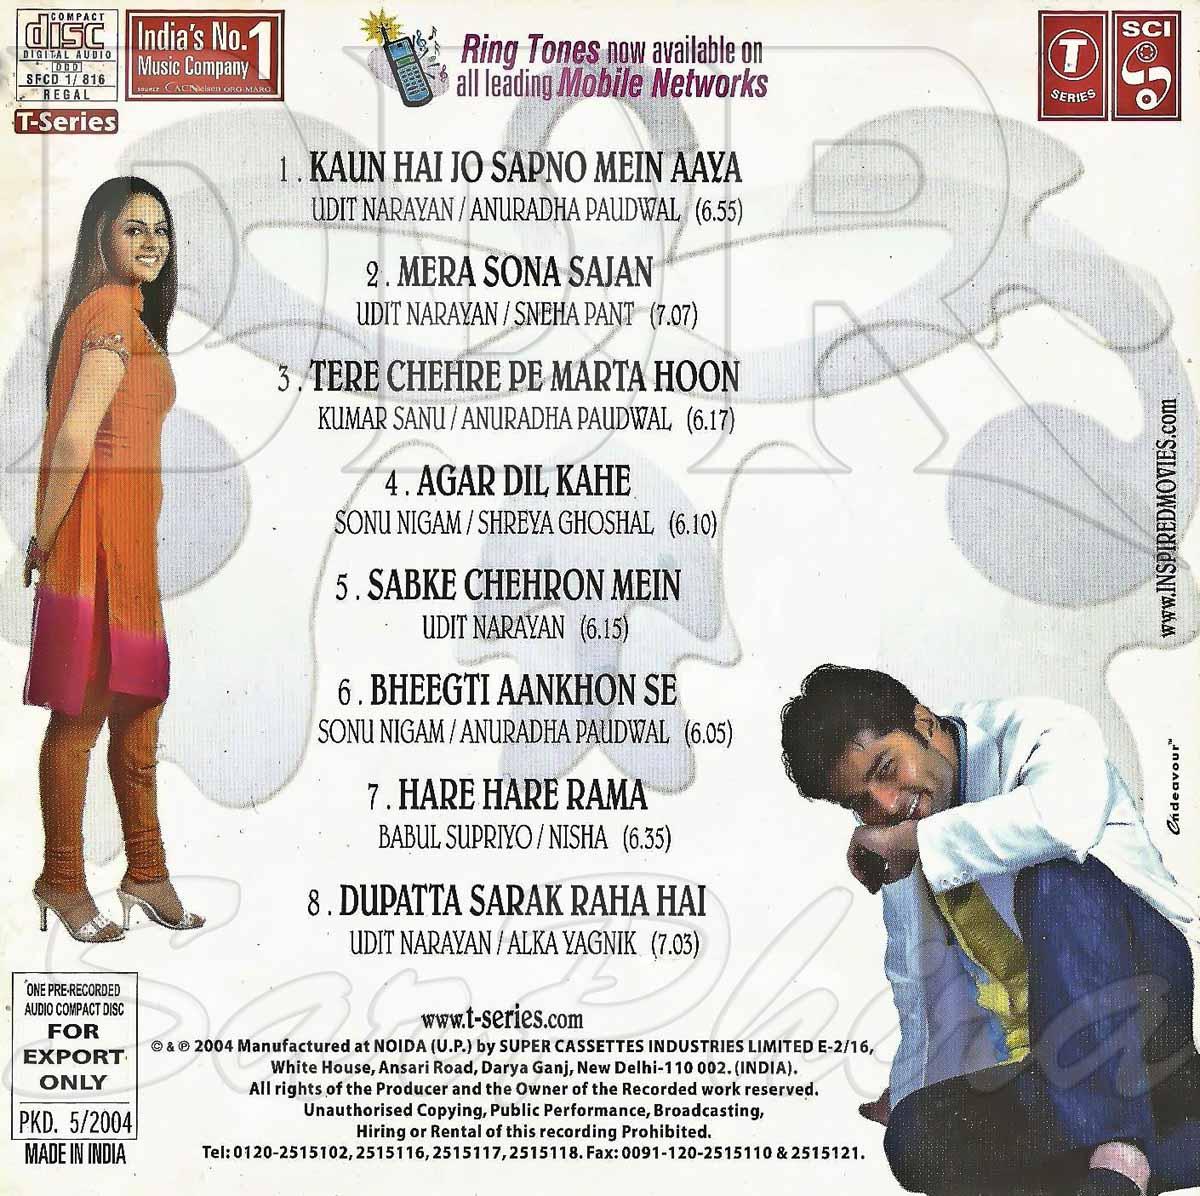 Koi Puche Mere Dil Se Song Download 320kbps: THE HOME OF SHREYA GHOSHAL SONGS: Kaun Hai Jo Sapno Mein